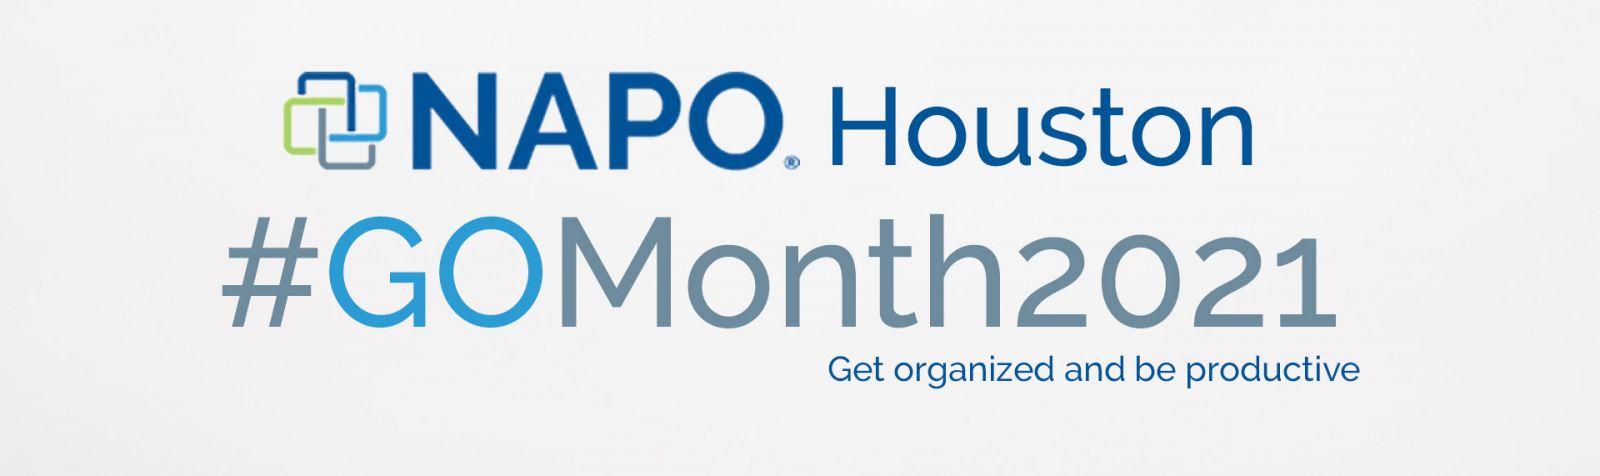 NAPO Go Month 2021 | NAPO Houston